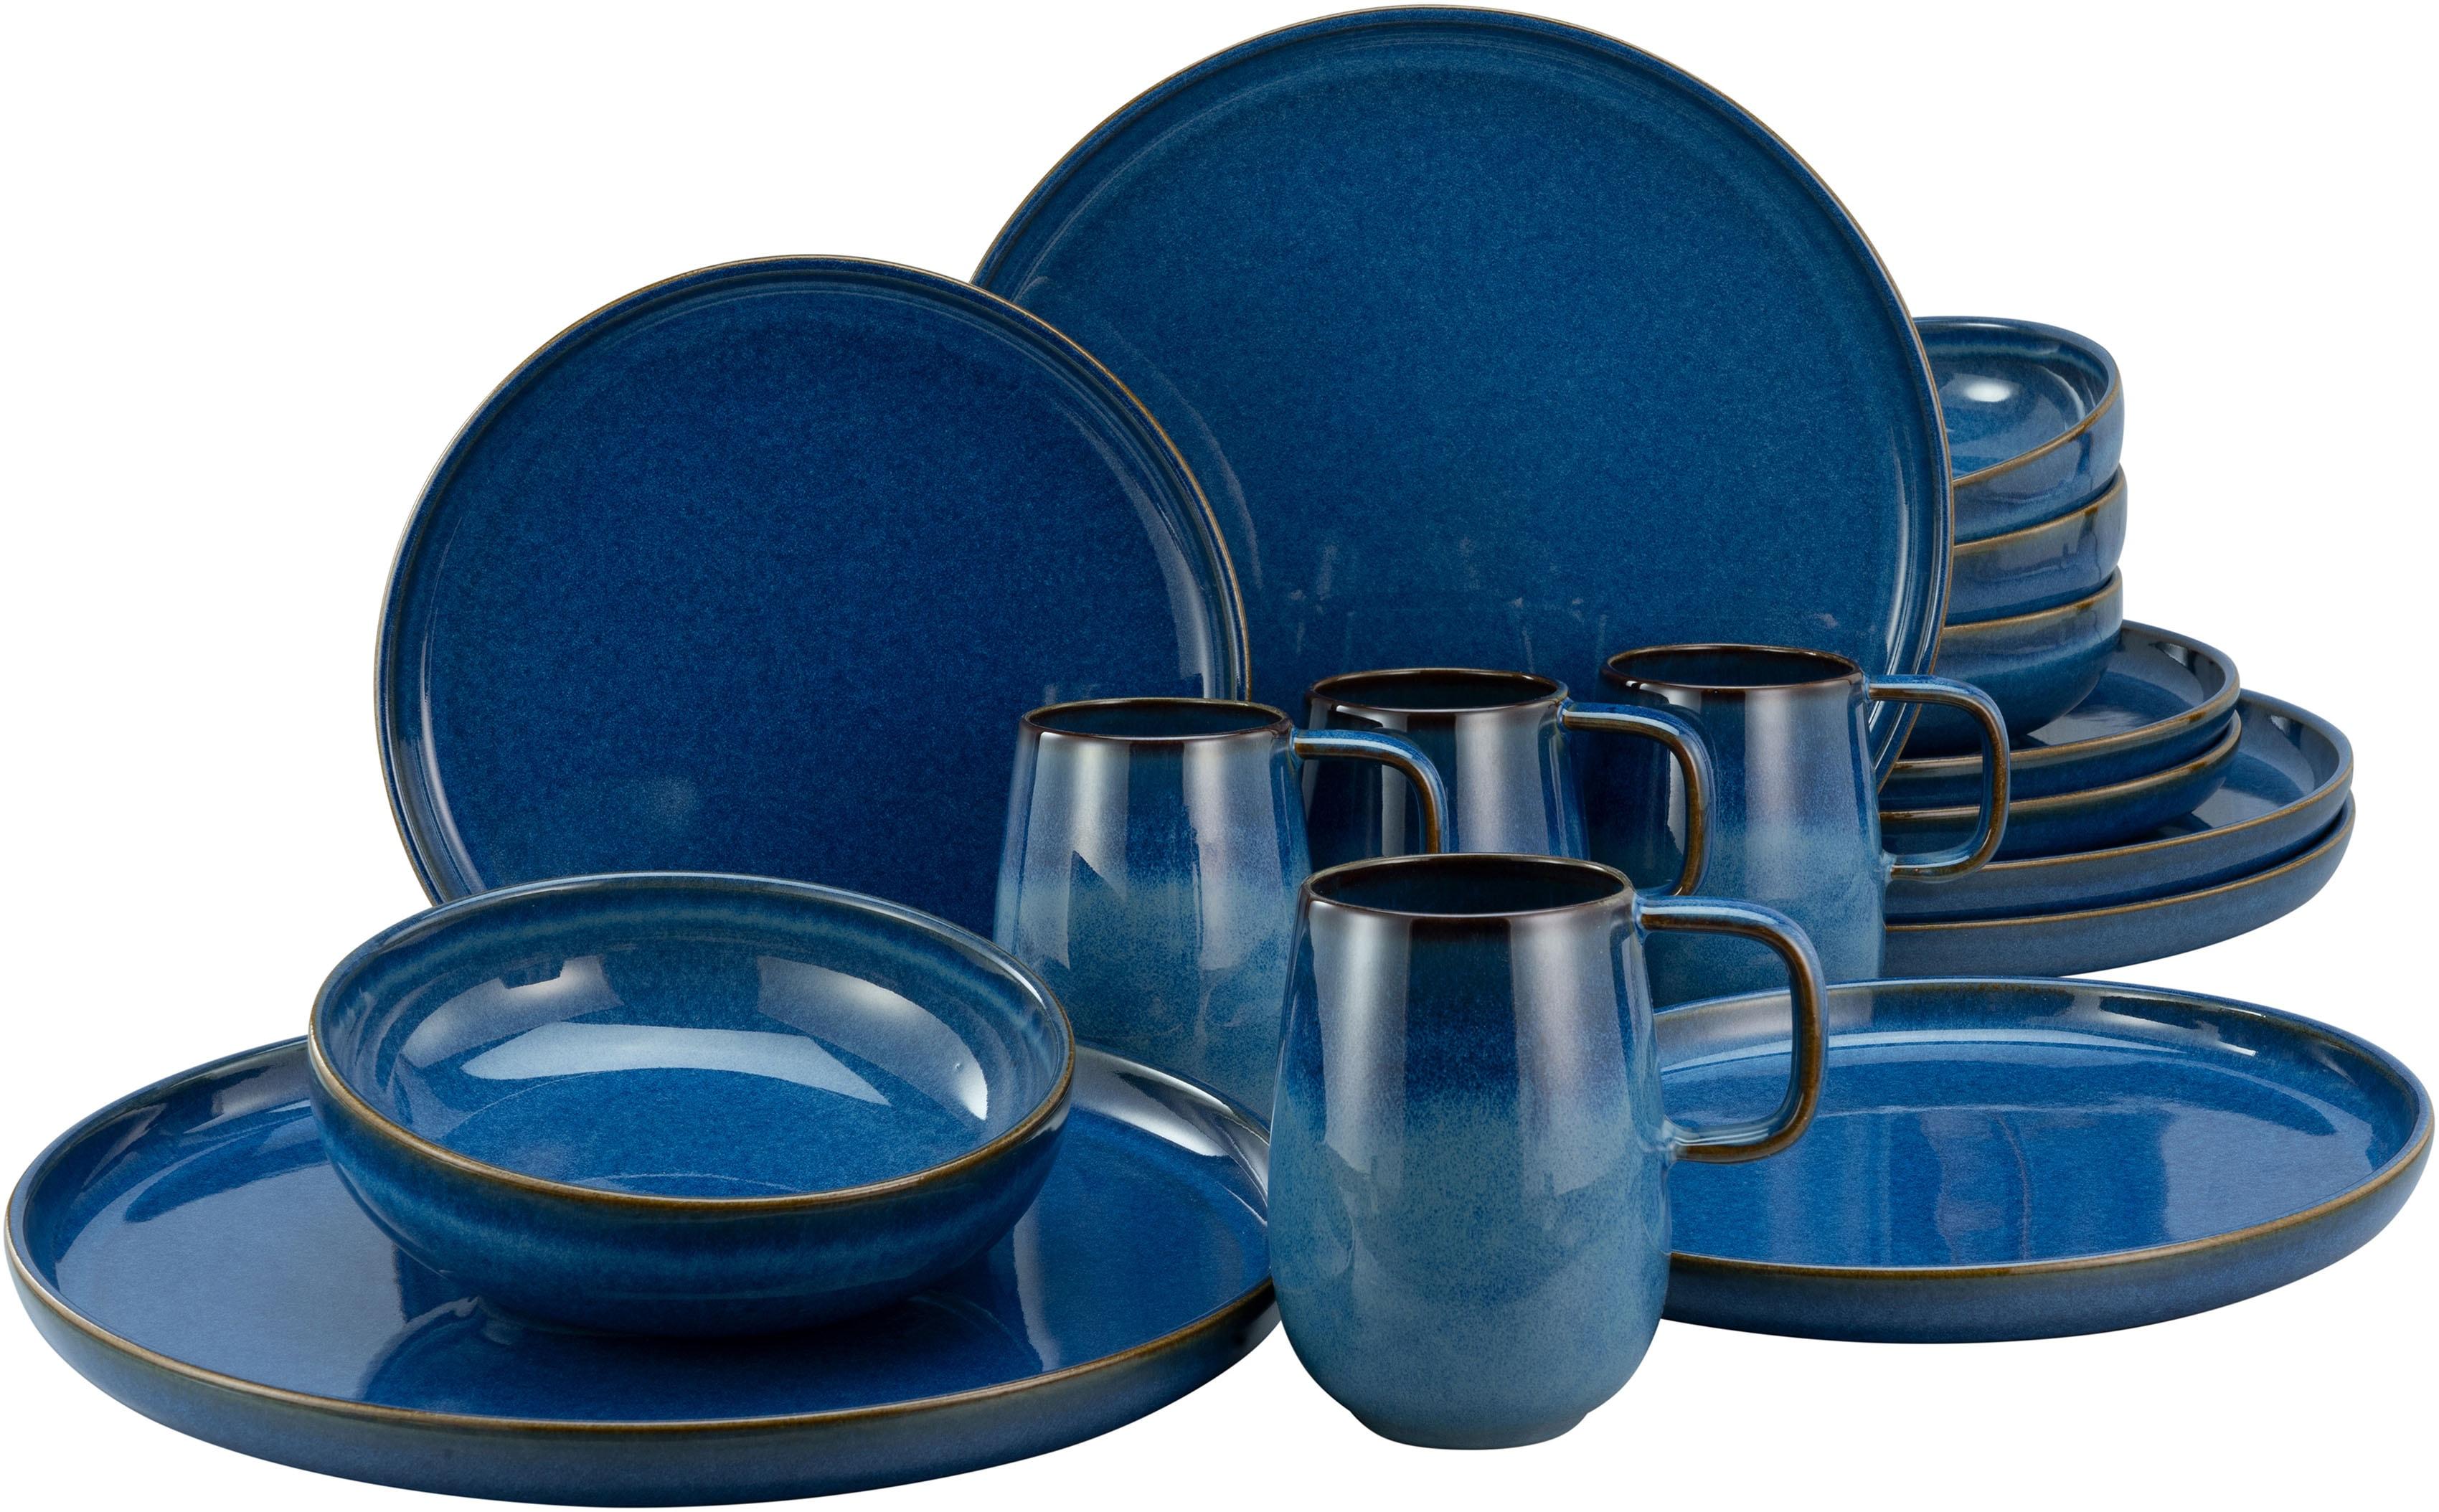 CreaTable Kombiservice Atlantico, (Set, 16 tlg.), mit intensiver Kobalt-Blau-Reaktivglasur blau Geschirr-Sets Geschirr, Porzellan Tischaccessoires Haushaltswaren